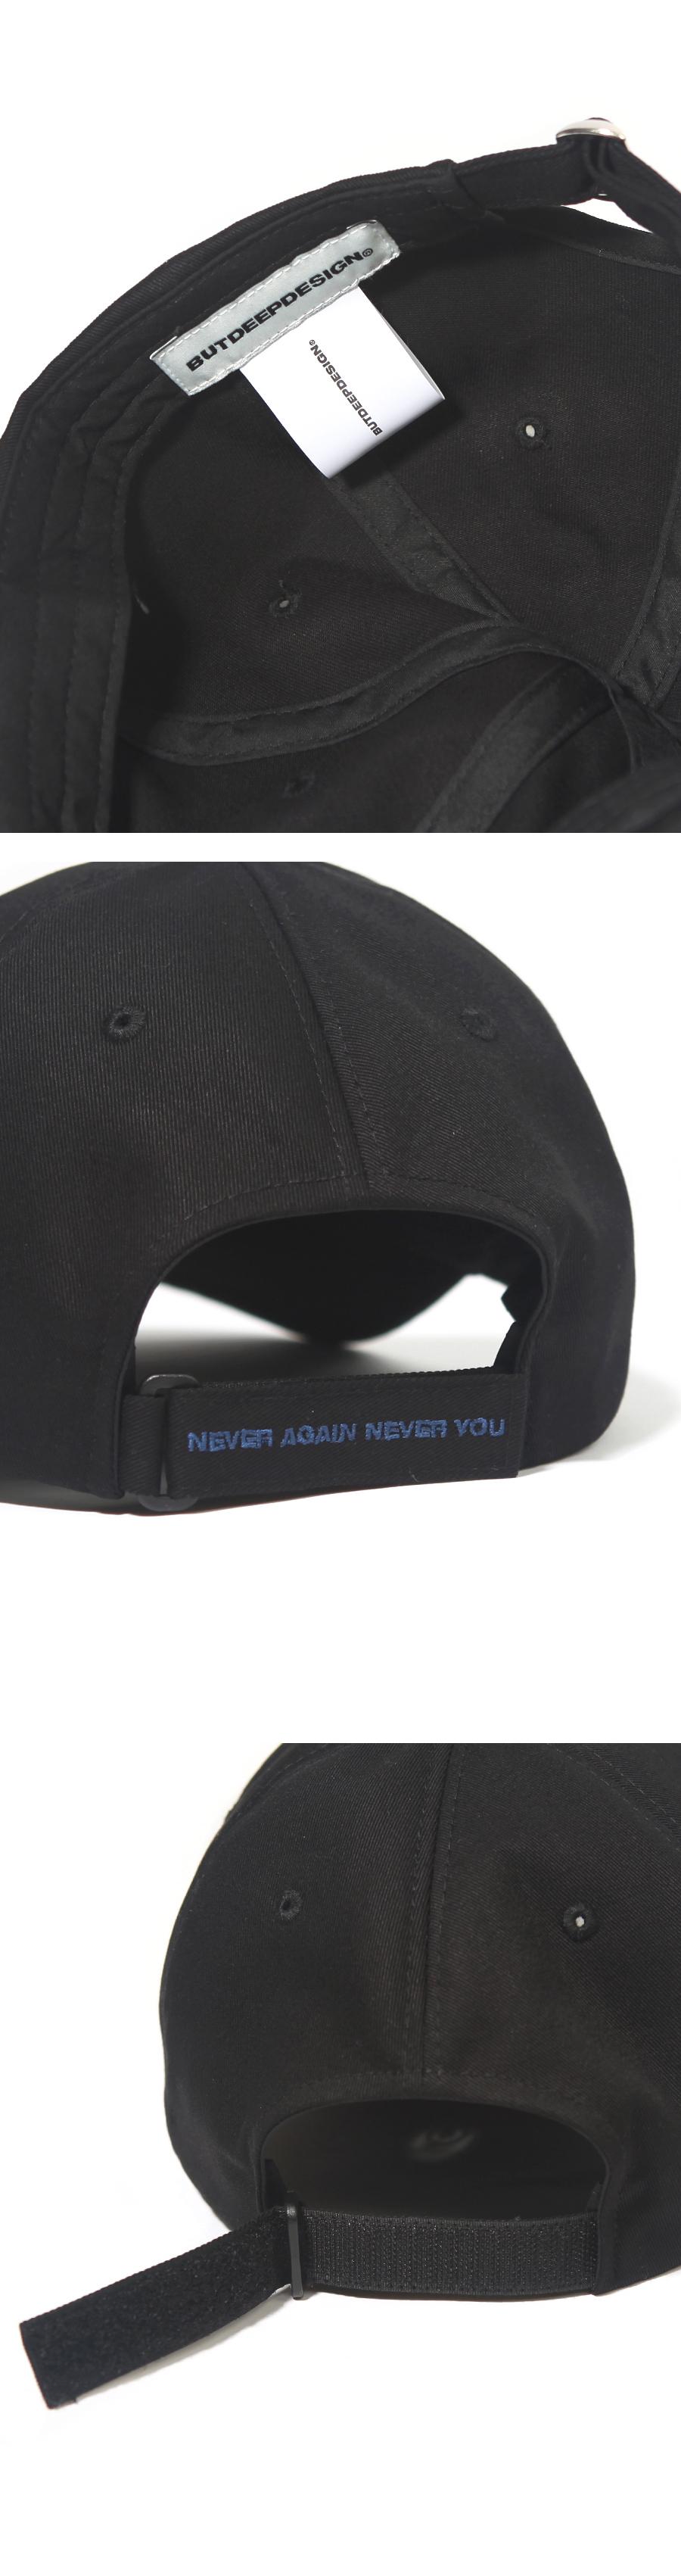 20AW 벨크로 웨이브 커브캡-블랙